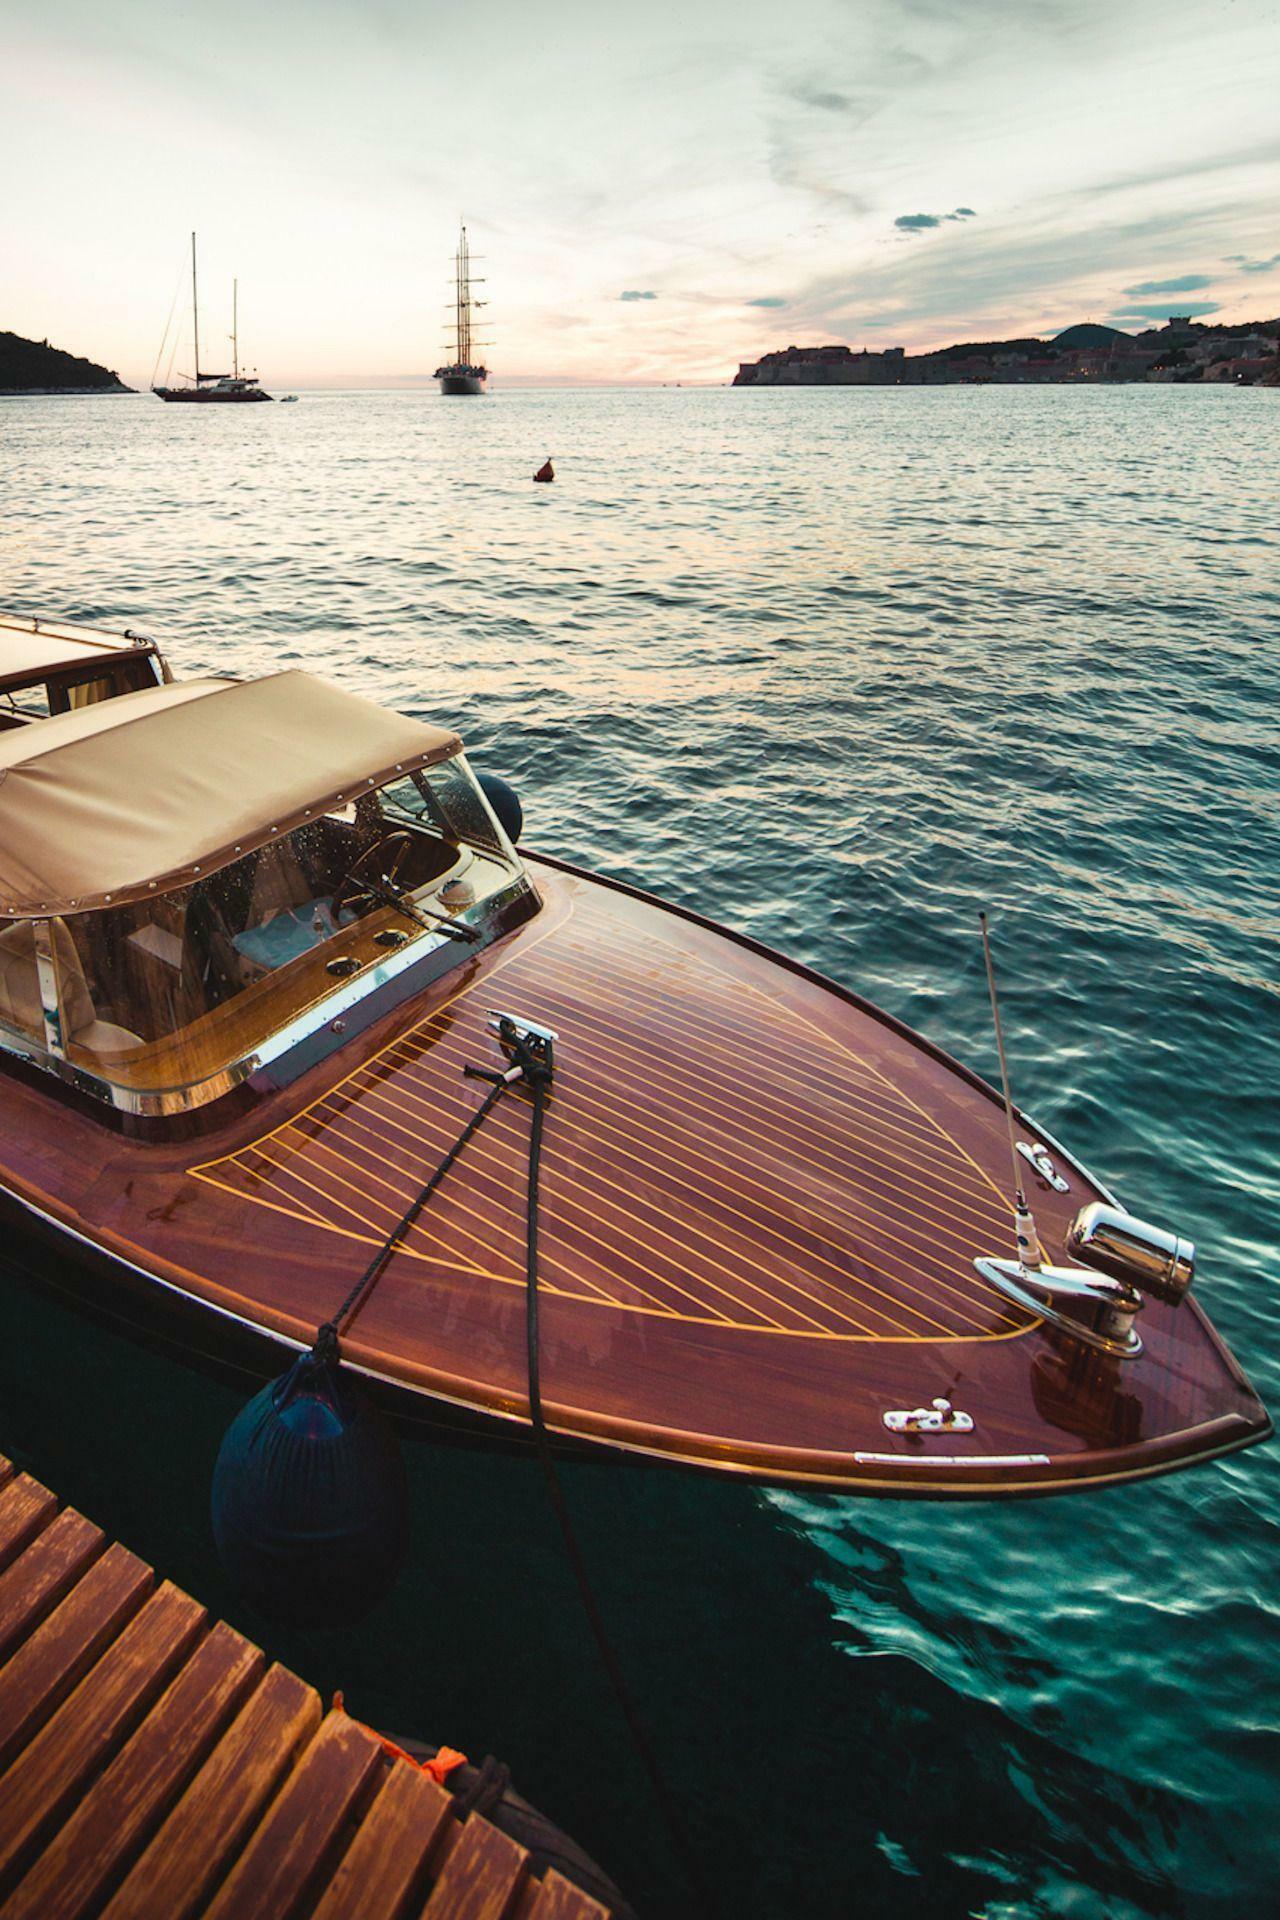 bulova owatrol yacht vernis brillante finitura resistente all'acqua 0,75 litri